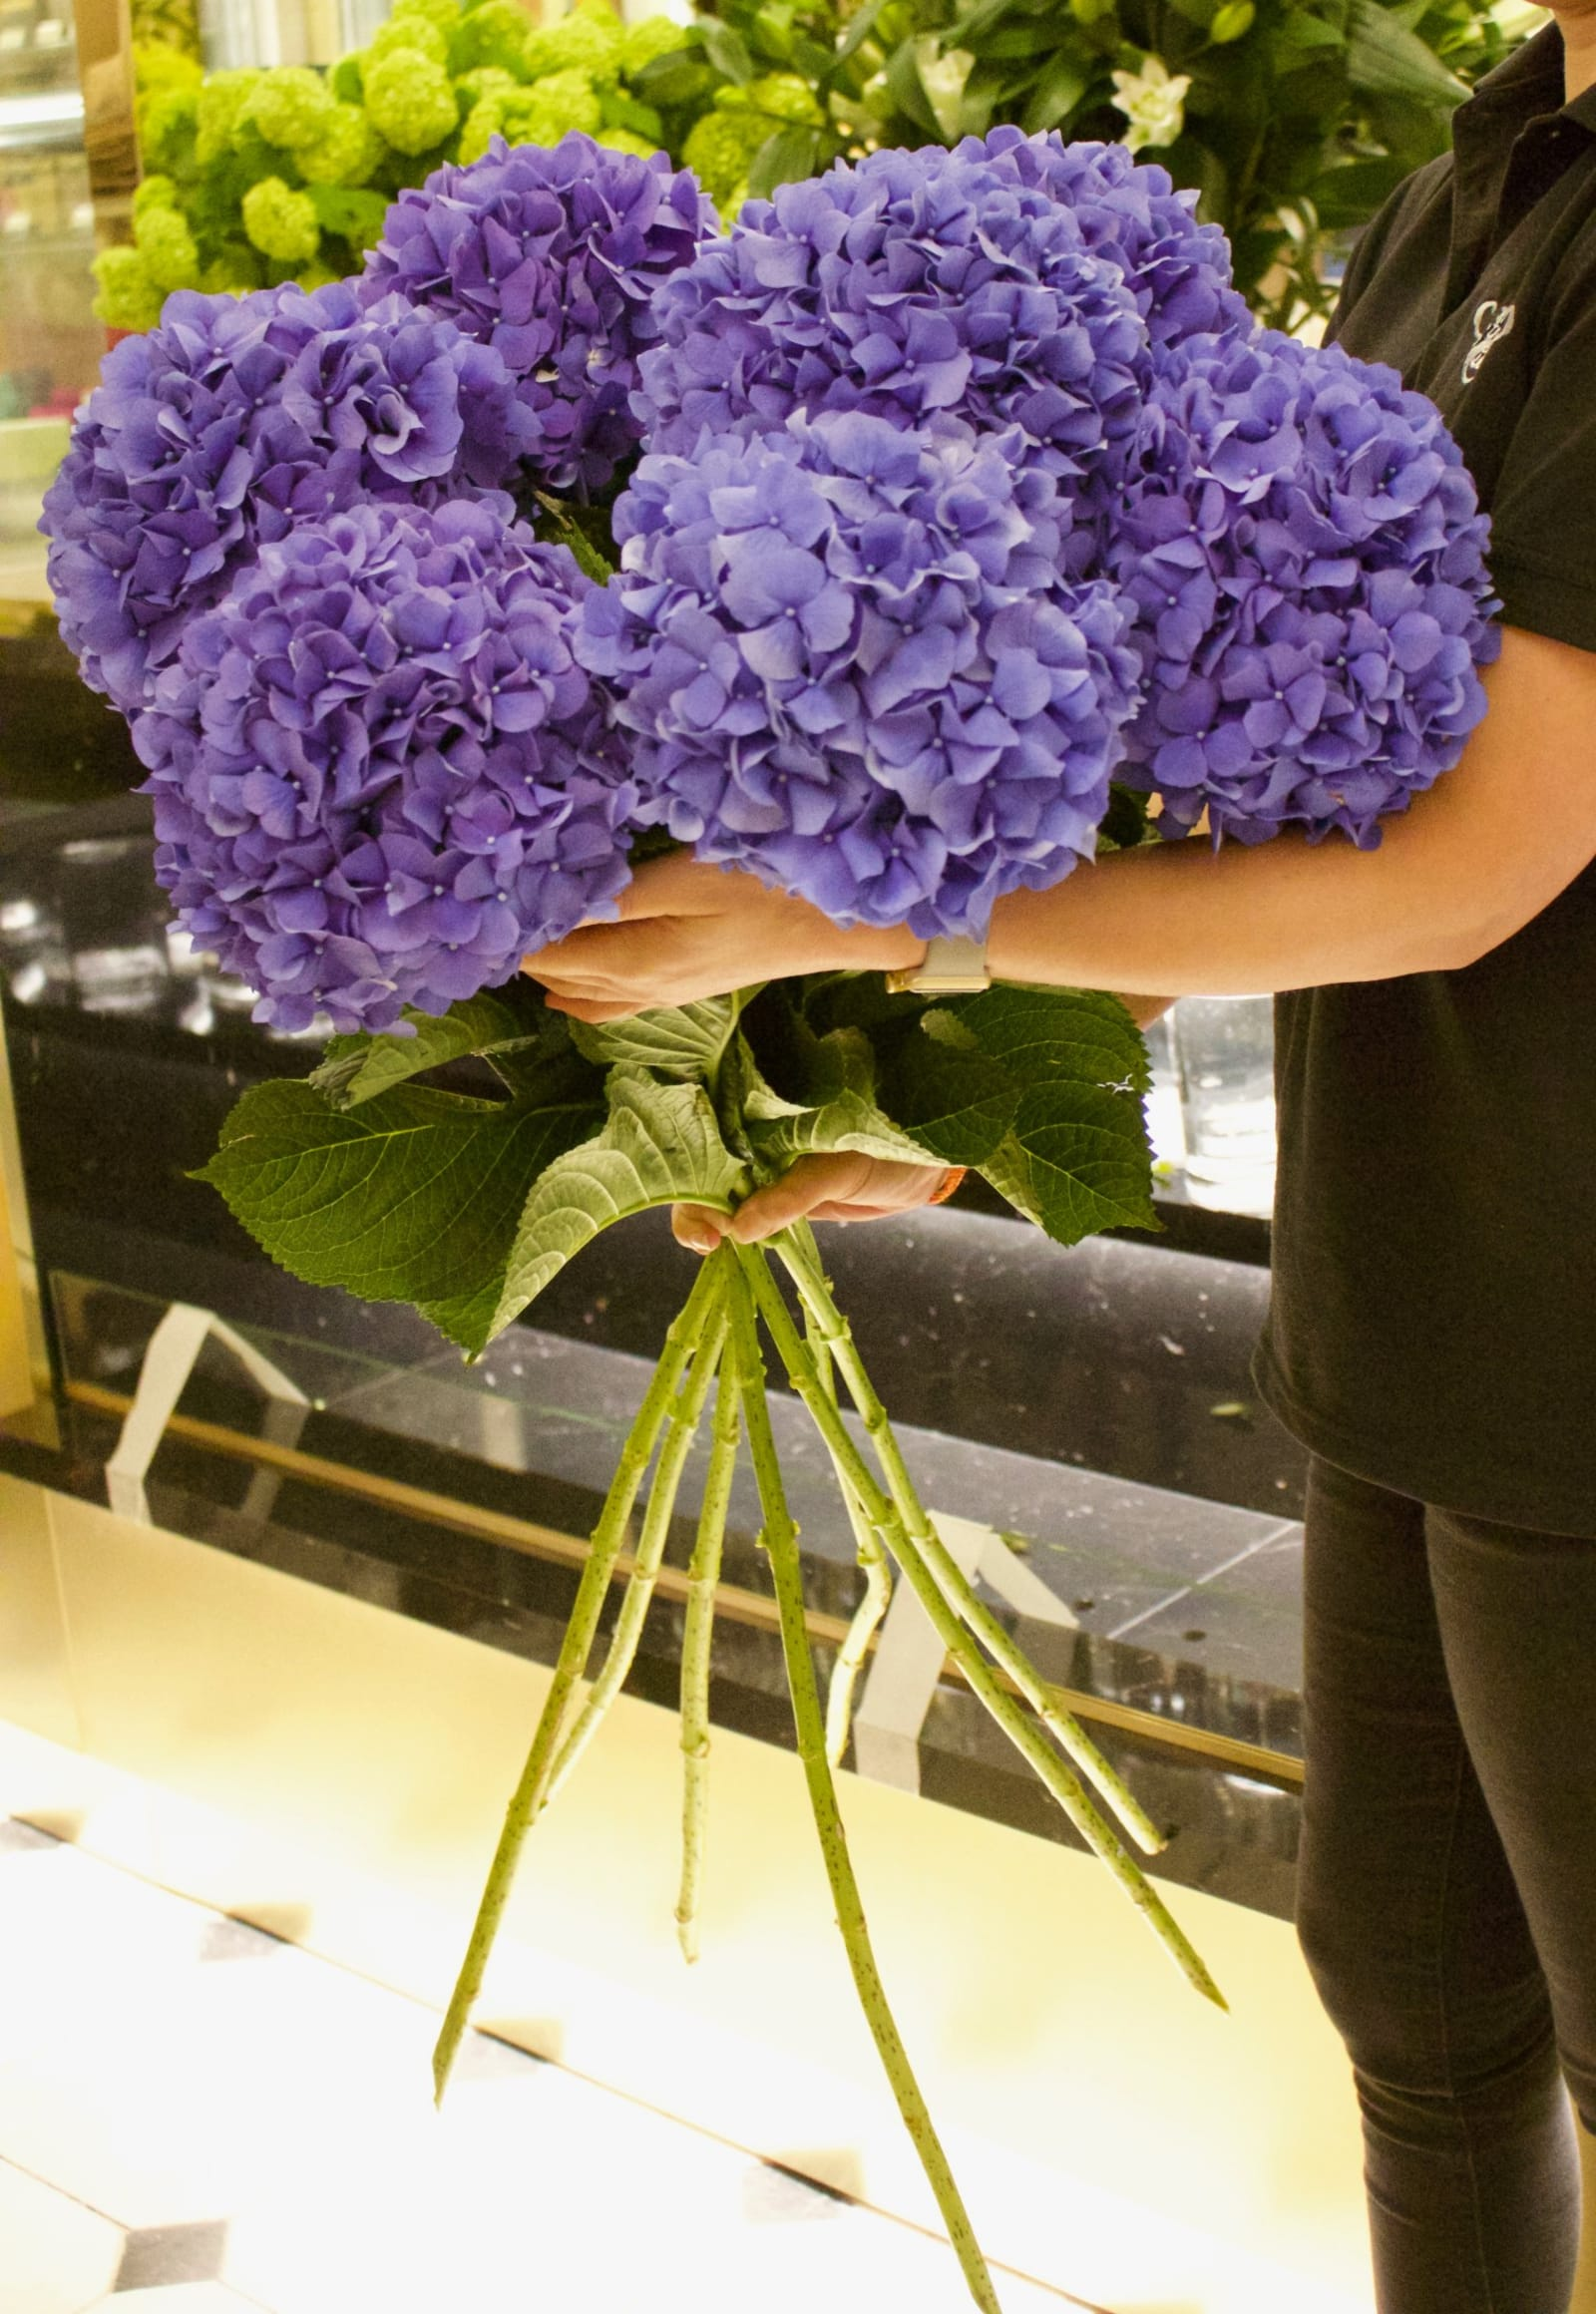 Purple flowers held by staff at Harrods in London.